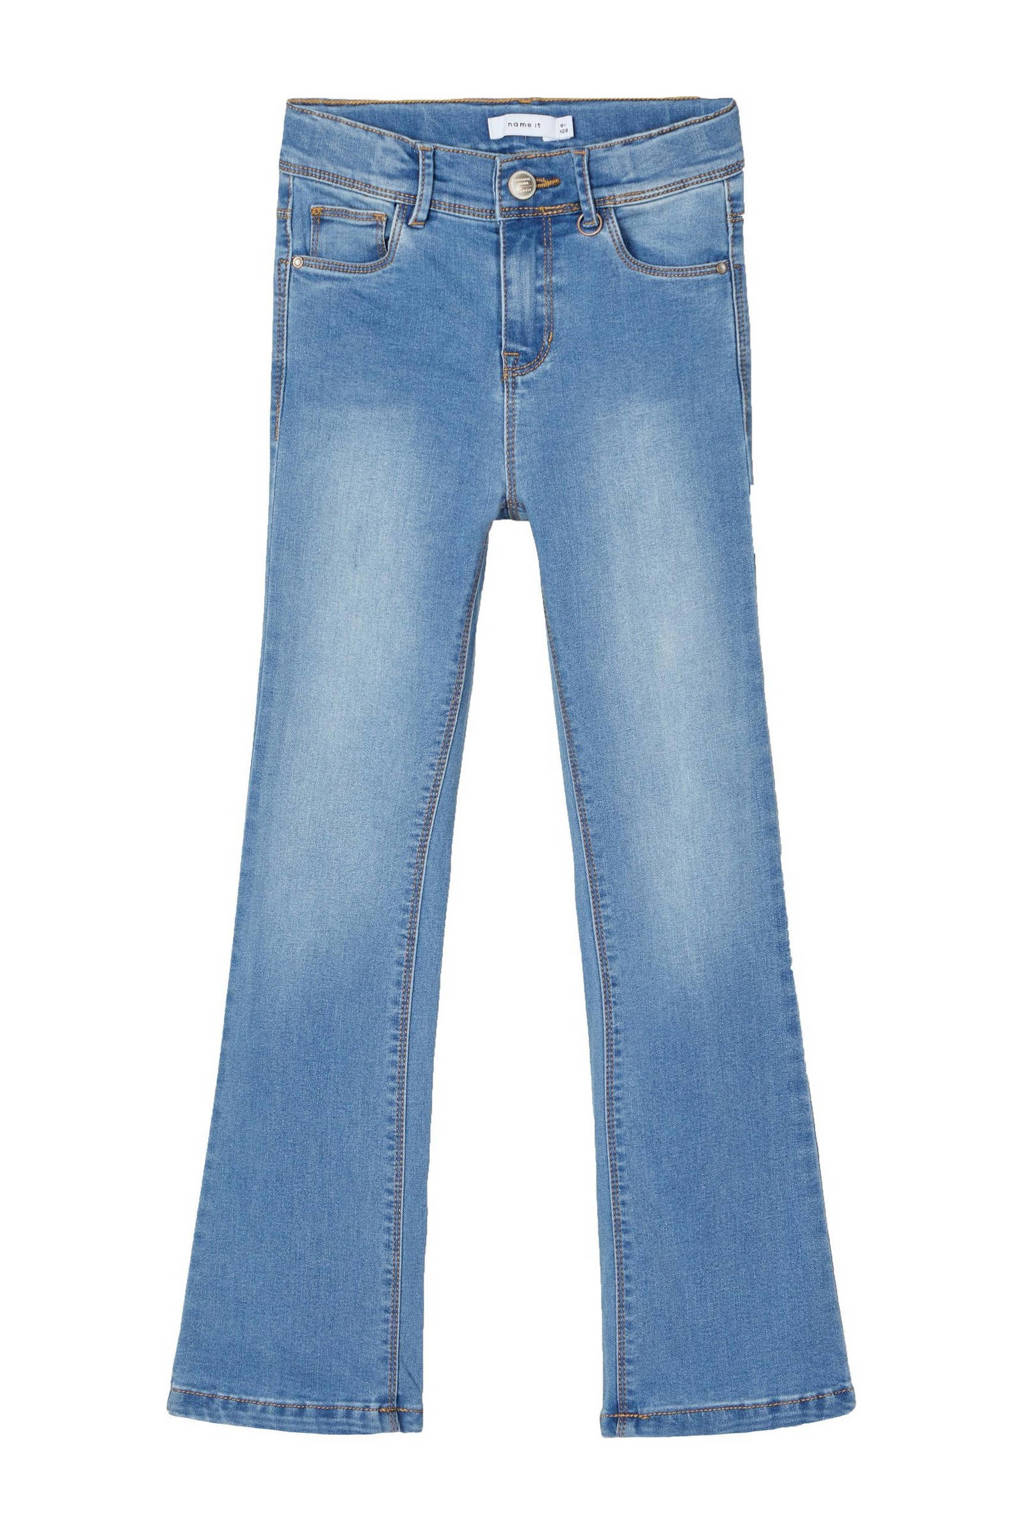 NAME IT KIDS bootcut jeans NKFPOLLY medium blue denim, Medium blue denim